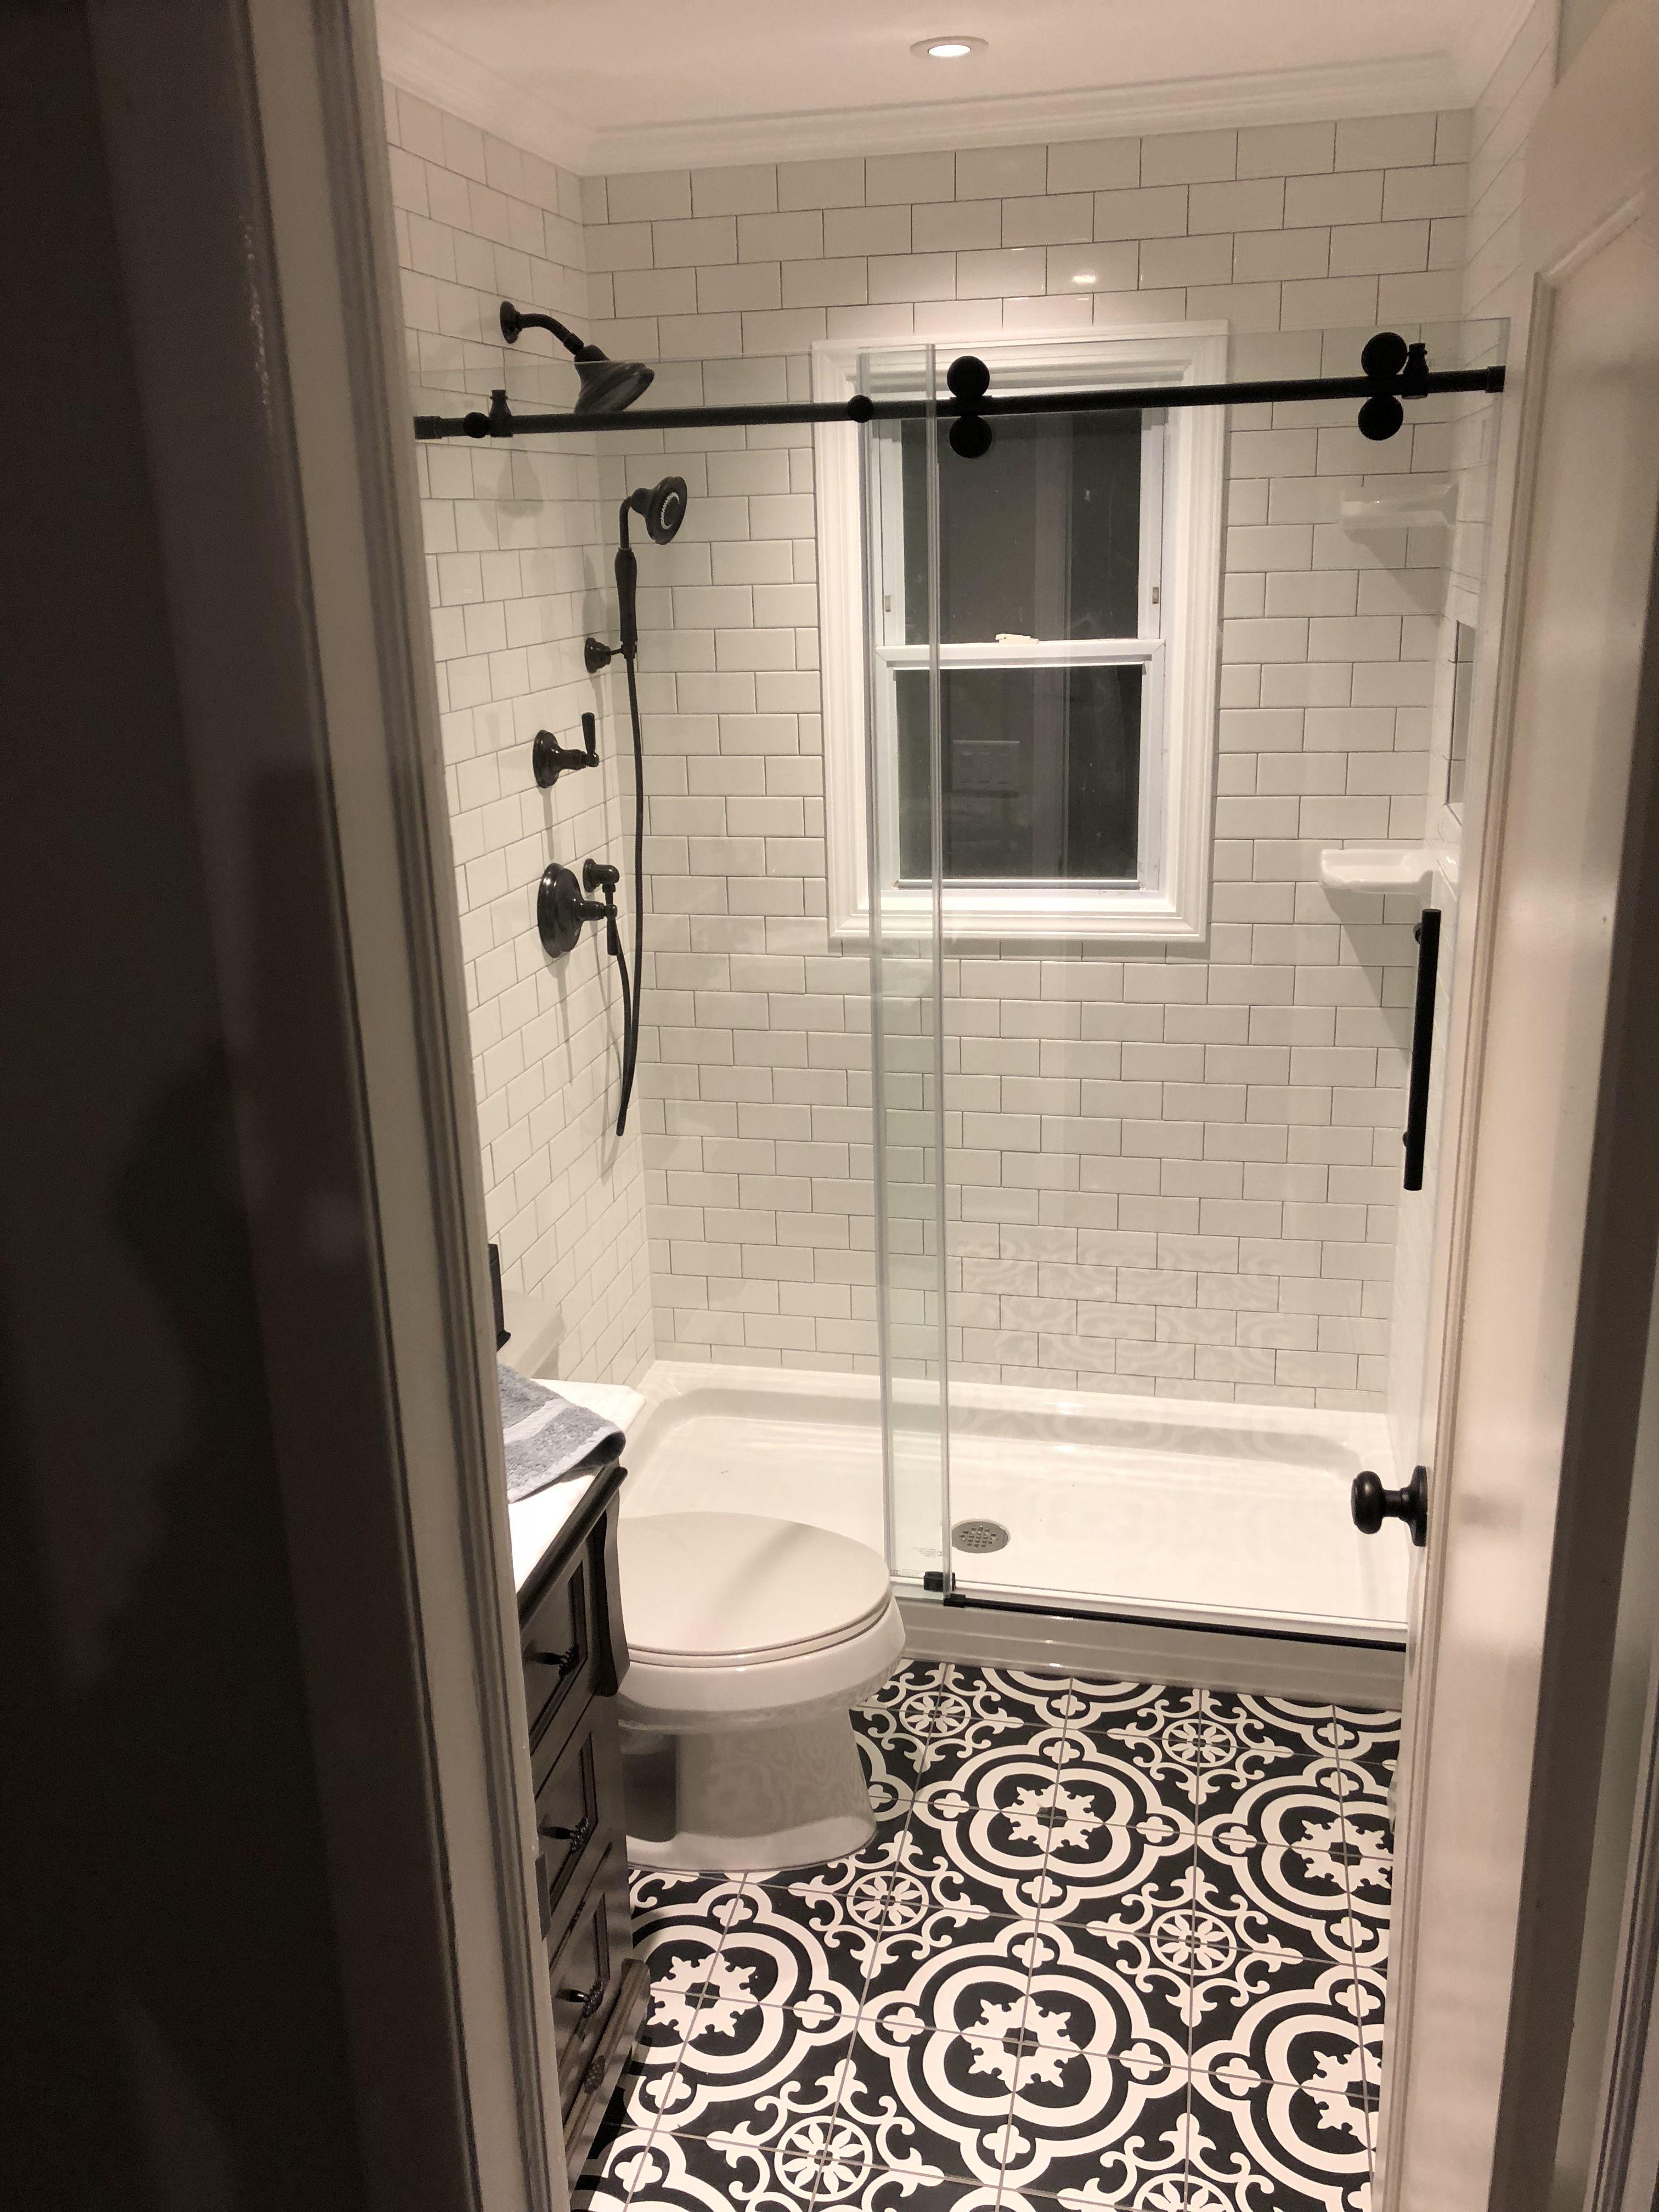 DIY vintage rustic bathroom remodel | Bathroom Design | Pinterest ...